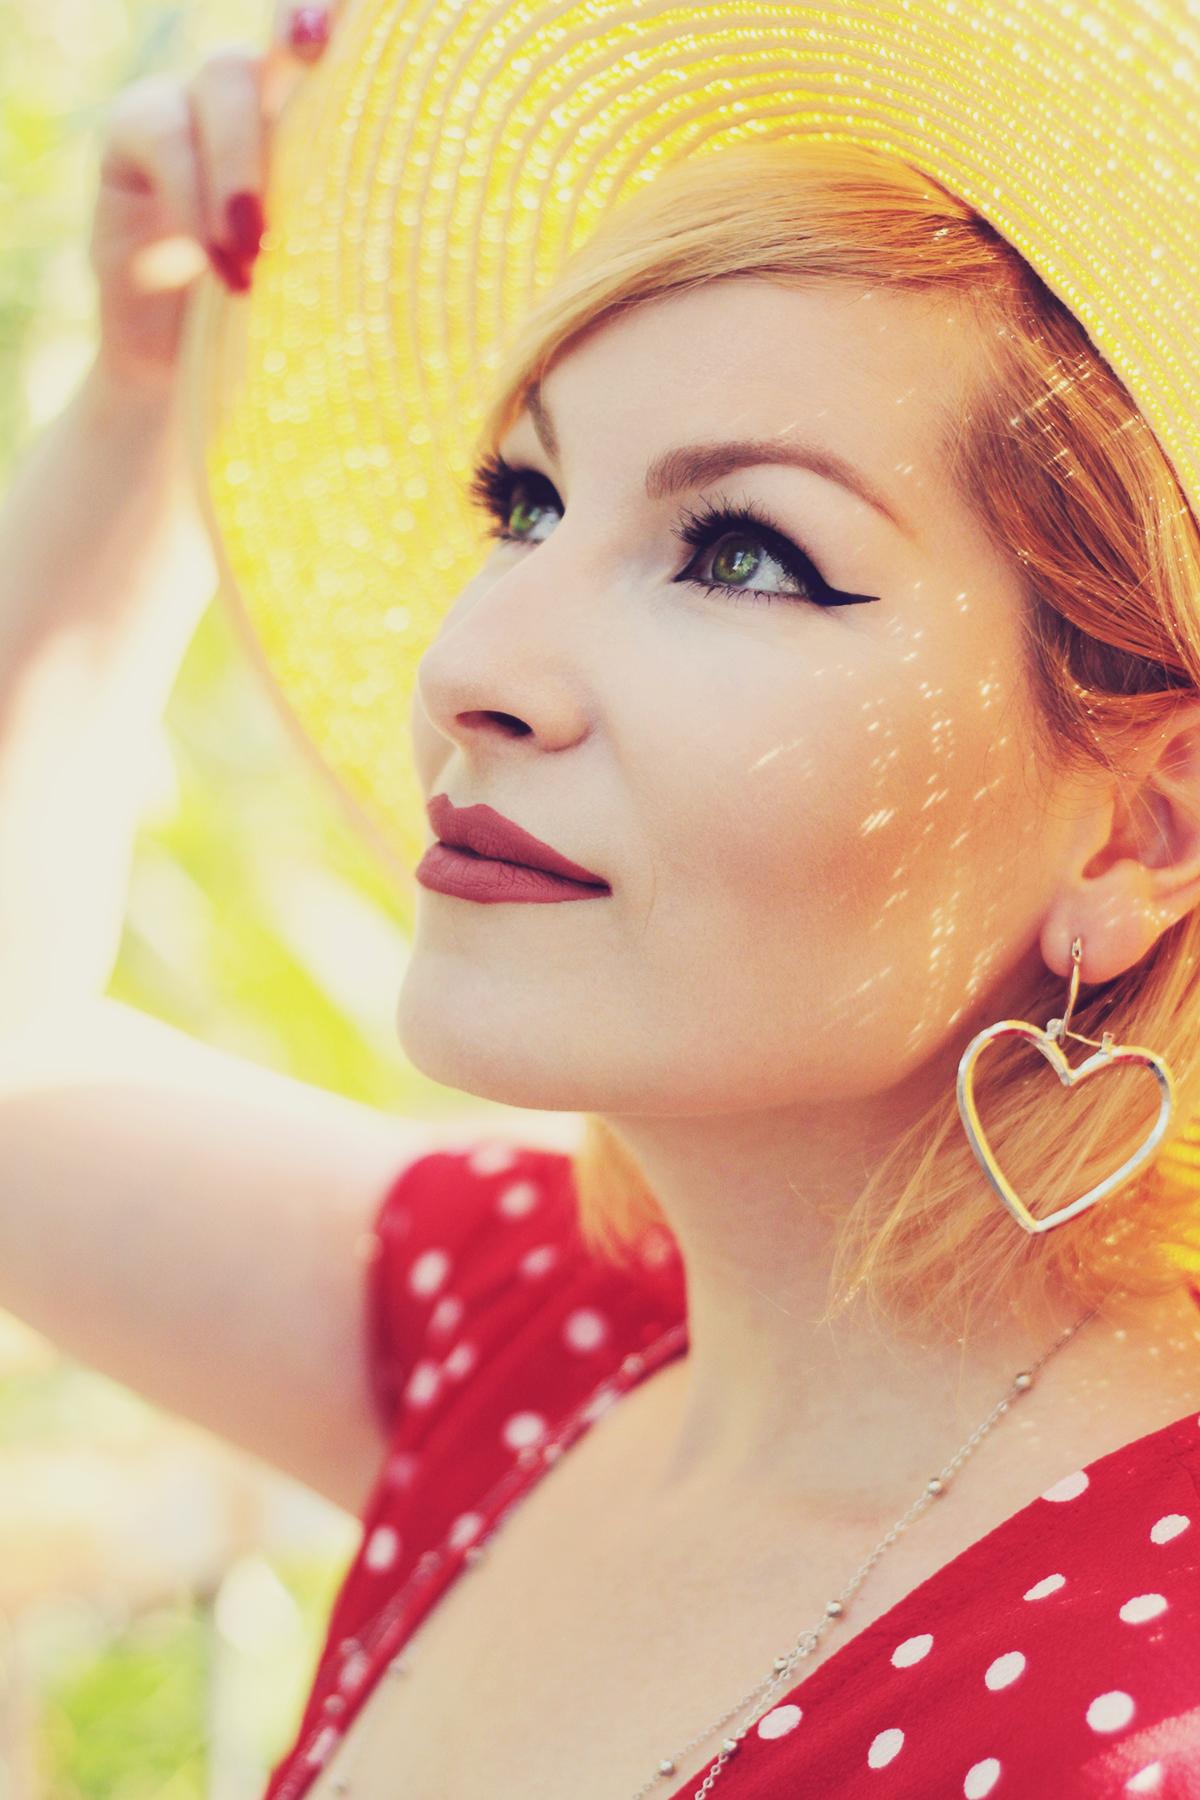 heart earrings, make-up, matte lips, polka dot dress